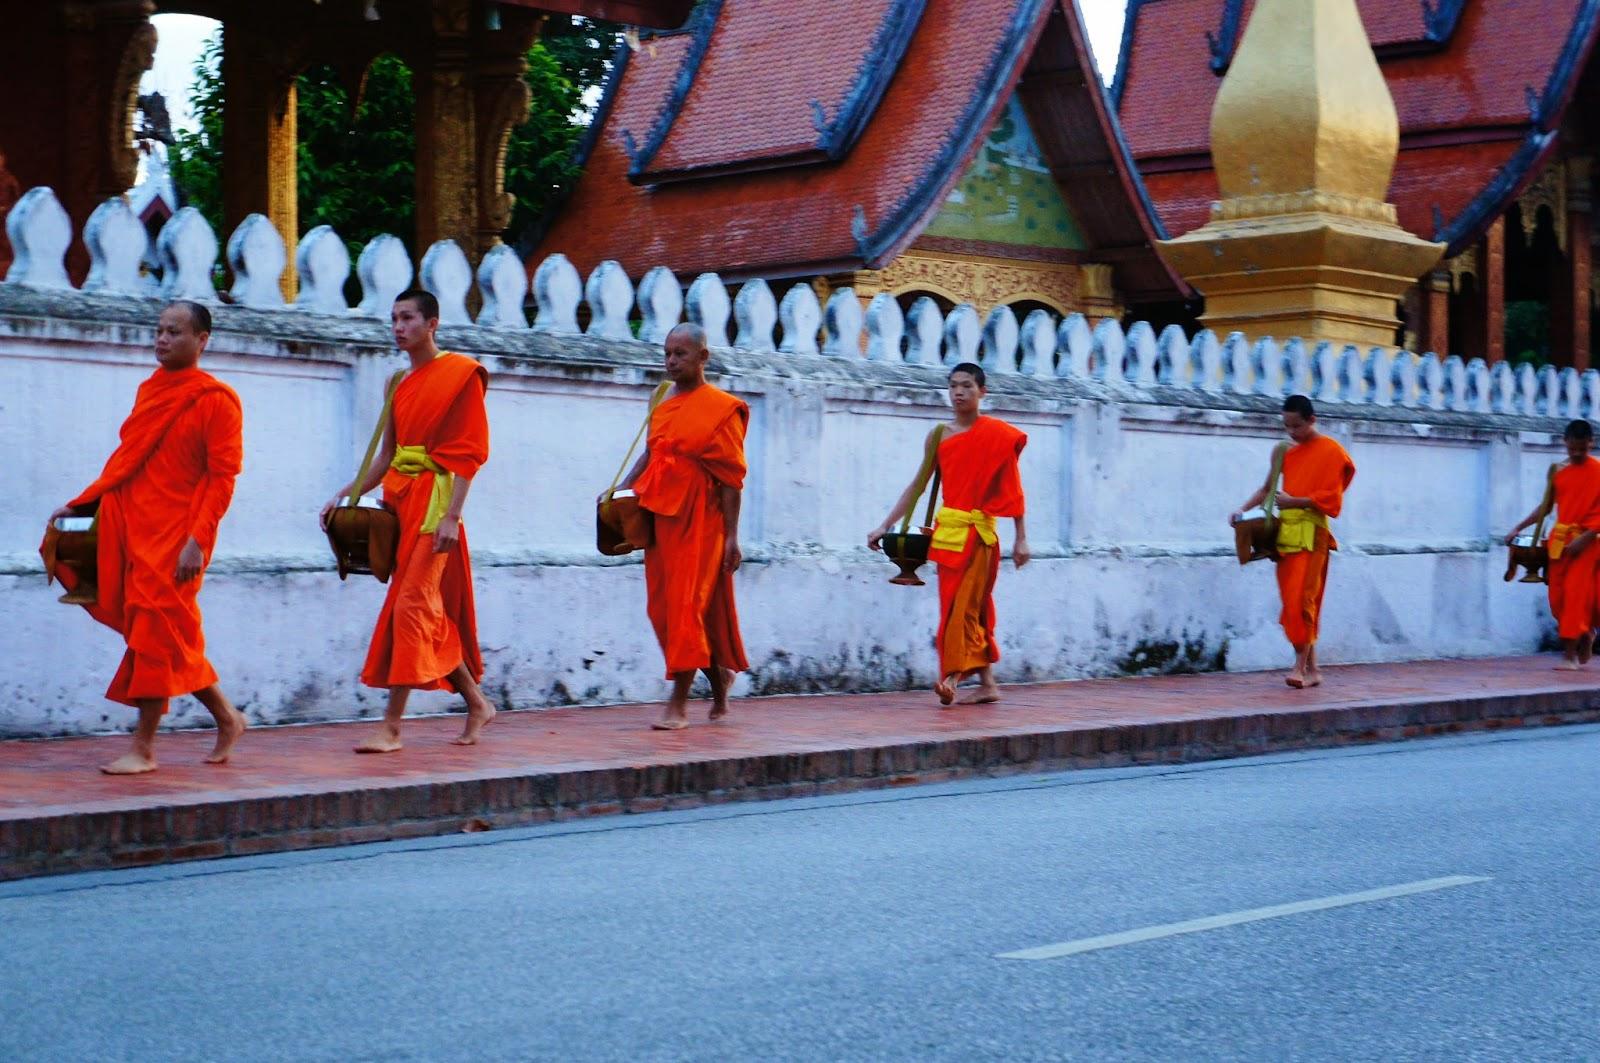 Luang Prabang - Monks in procession